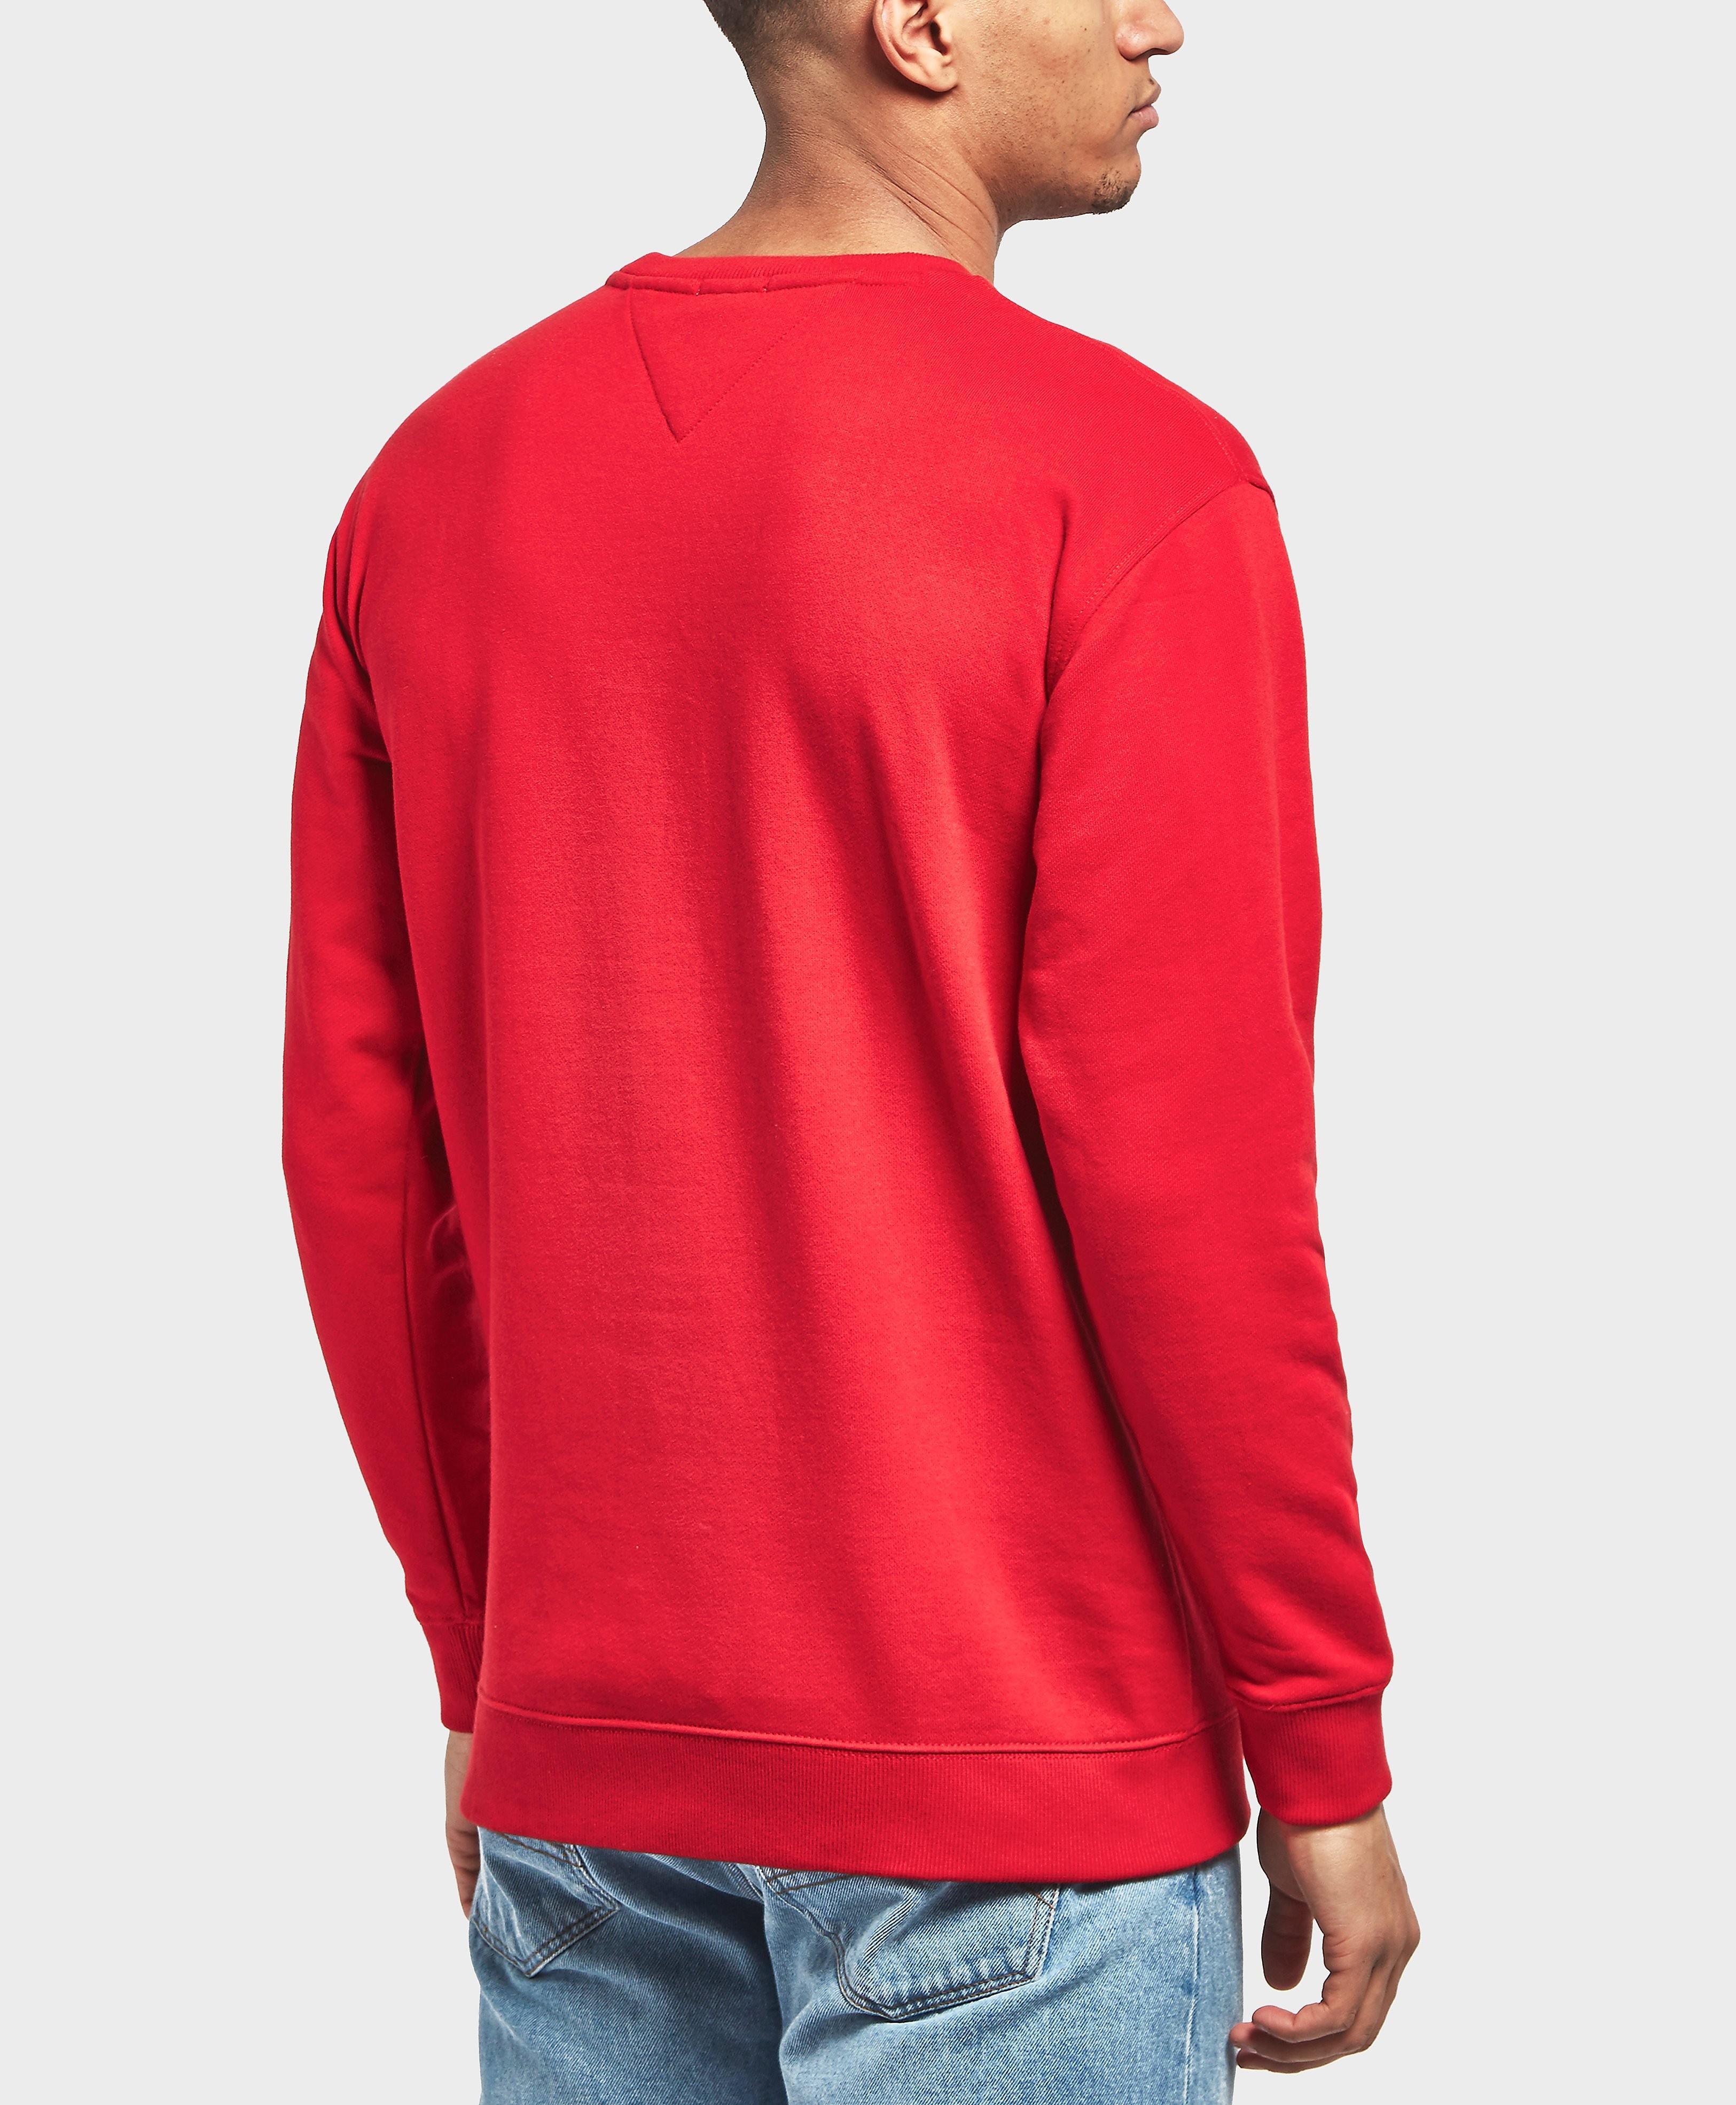 Tommy Hilfiger NYC Logo Crew Sweatshirt